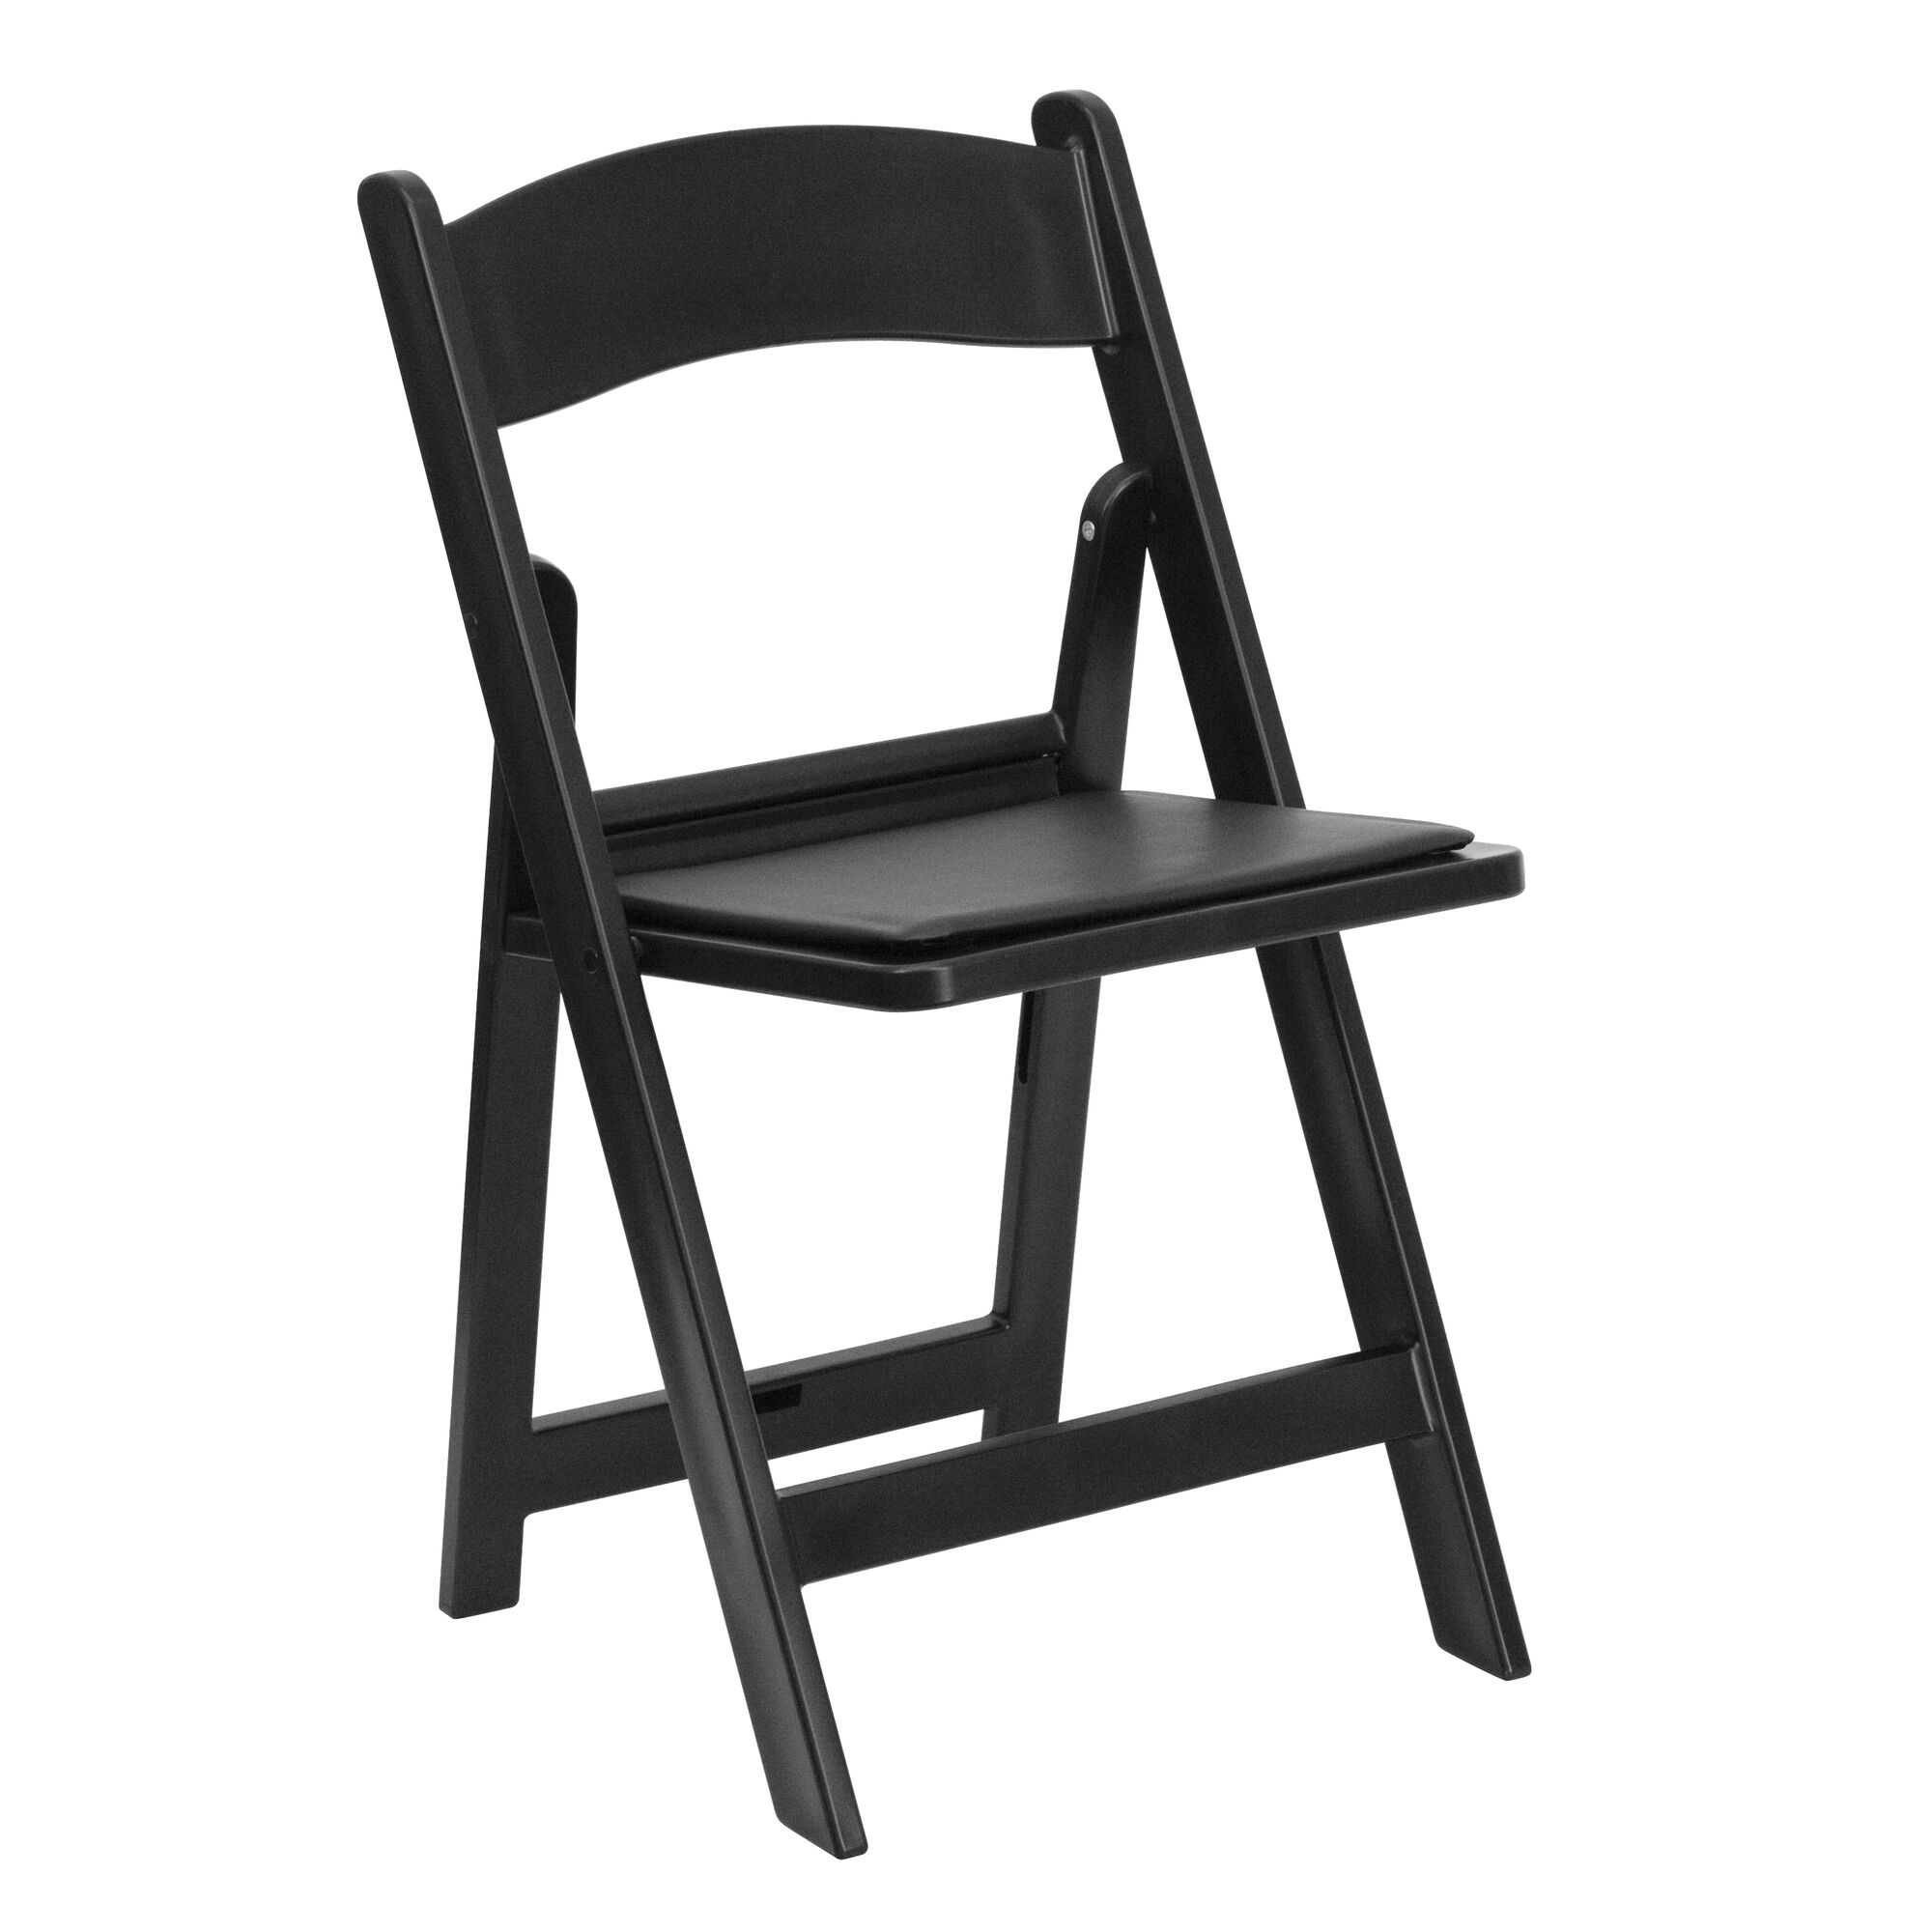 Surprising Hercules Series 1000 Lb Capacity Black Resin Folding Chair With Black Vinyl Padded Seat Theyellowbook Wood Chair Design Ideas Theyellowbookinfo